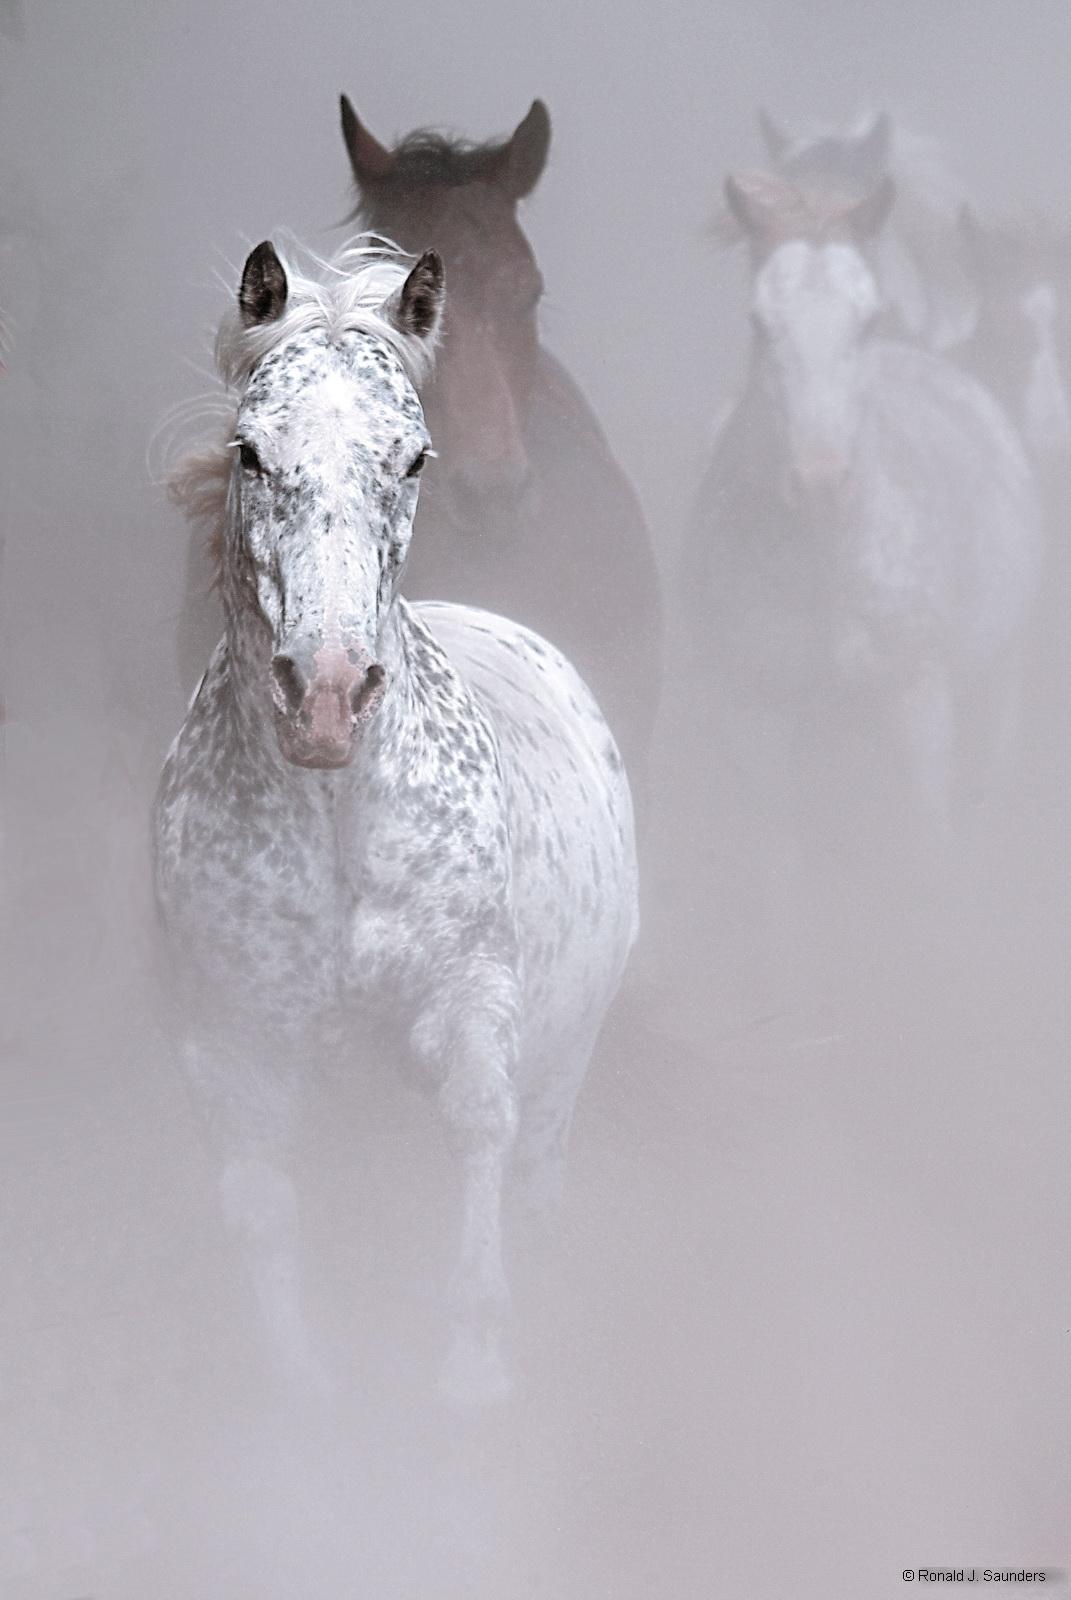 horses, running, michigan, animals,  ron, ron saunders, ronald, ronald j saunders, prints, photo